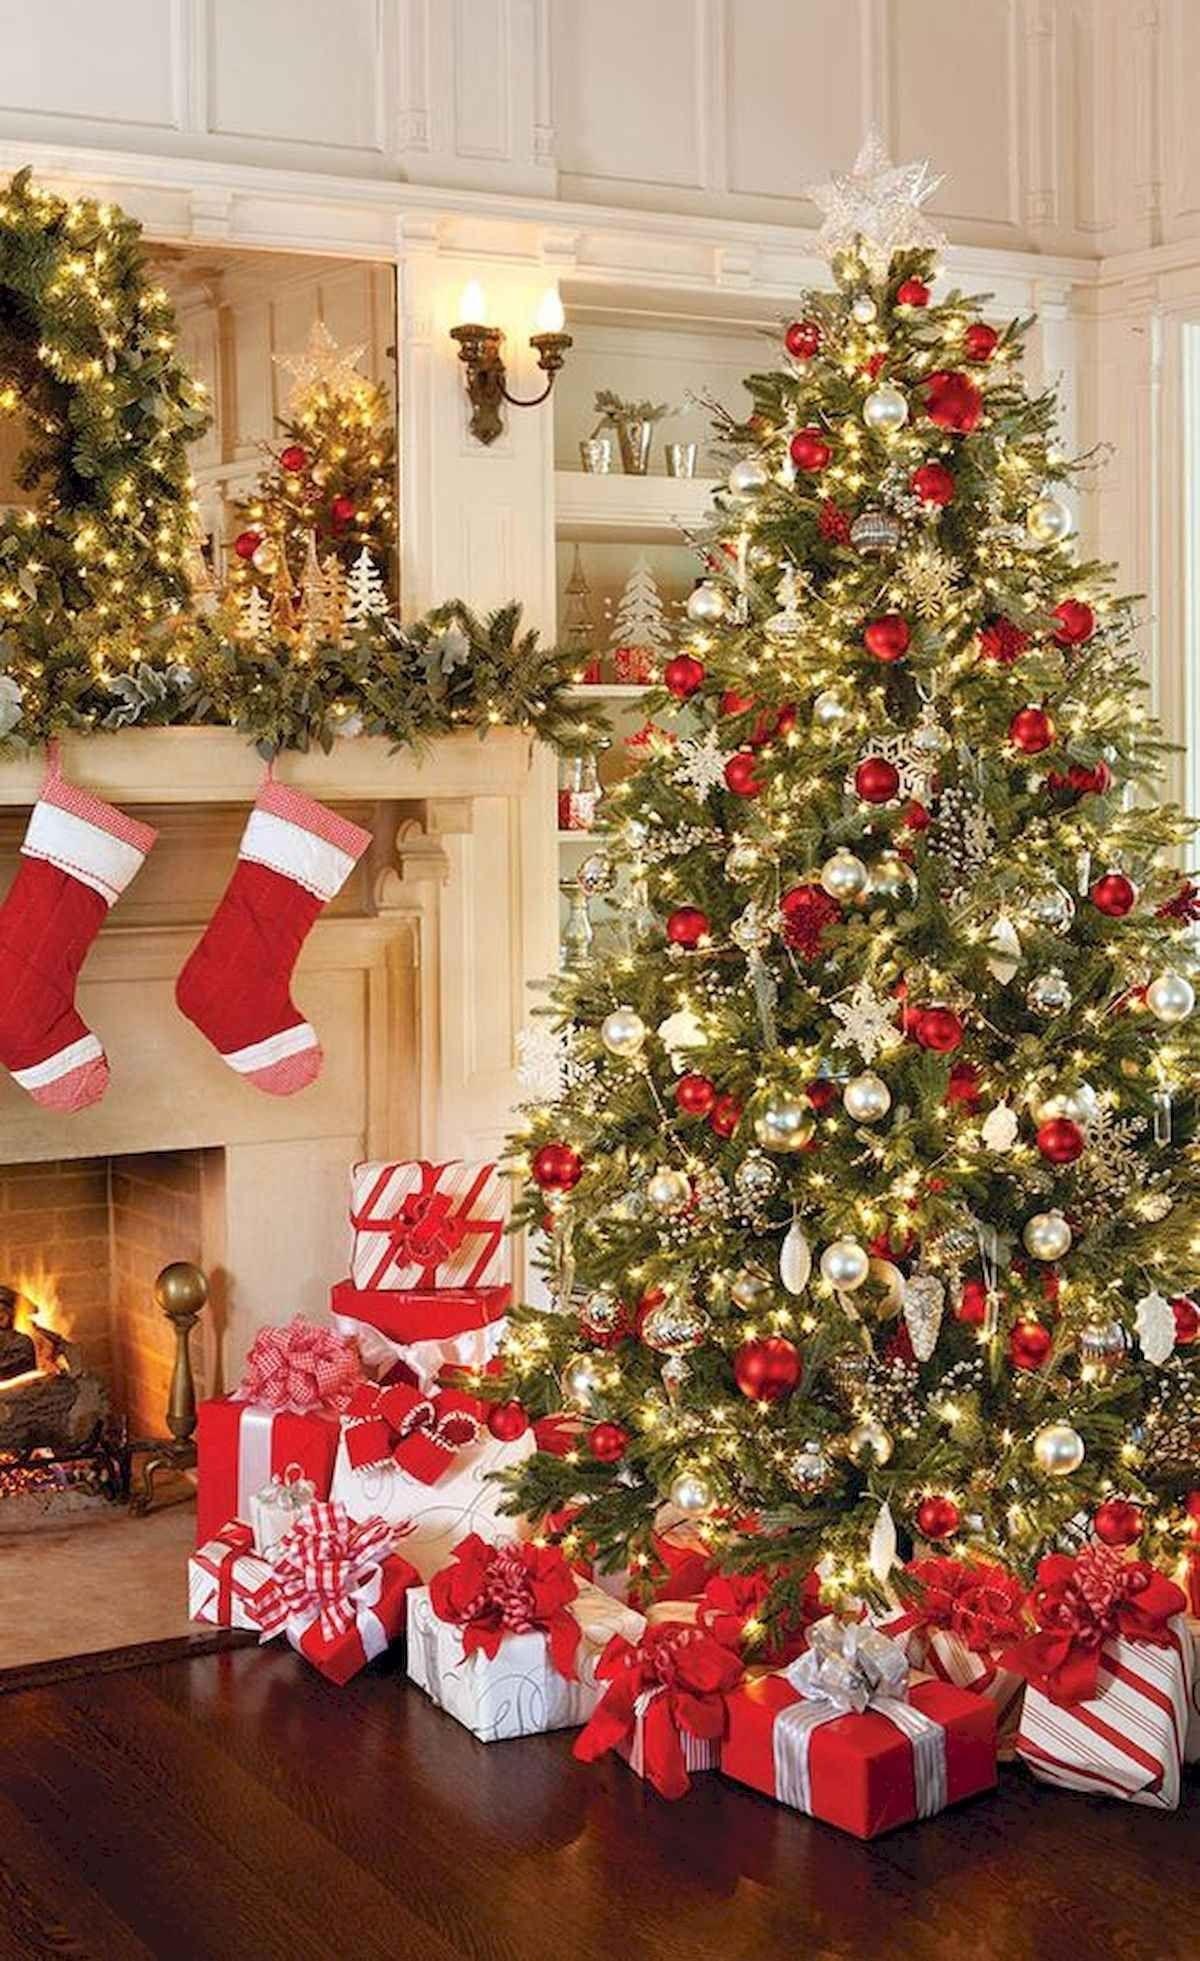 60 Awesome Christmas Tree Decor Ideas Holiday Decor Christmas Cool Christmas Trees Christmas Tree Inspiration